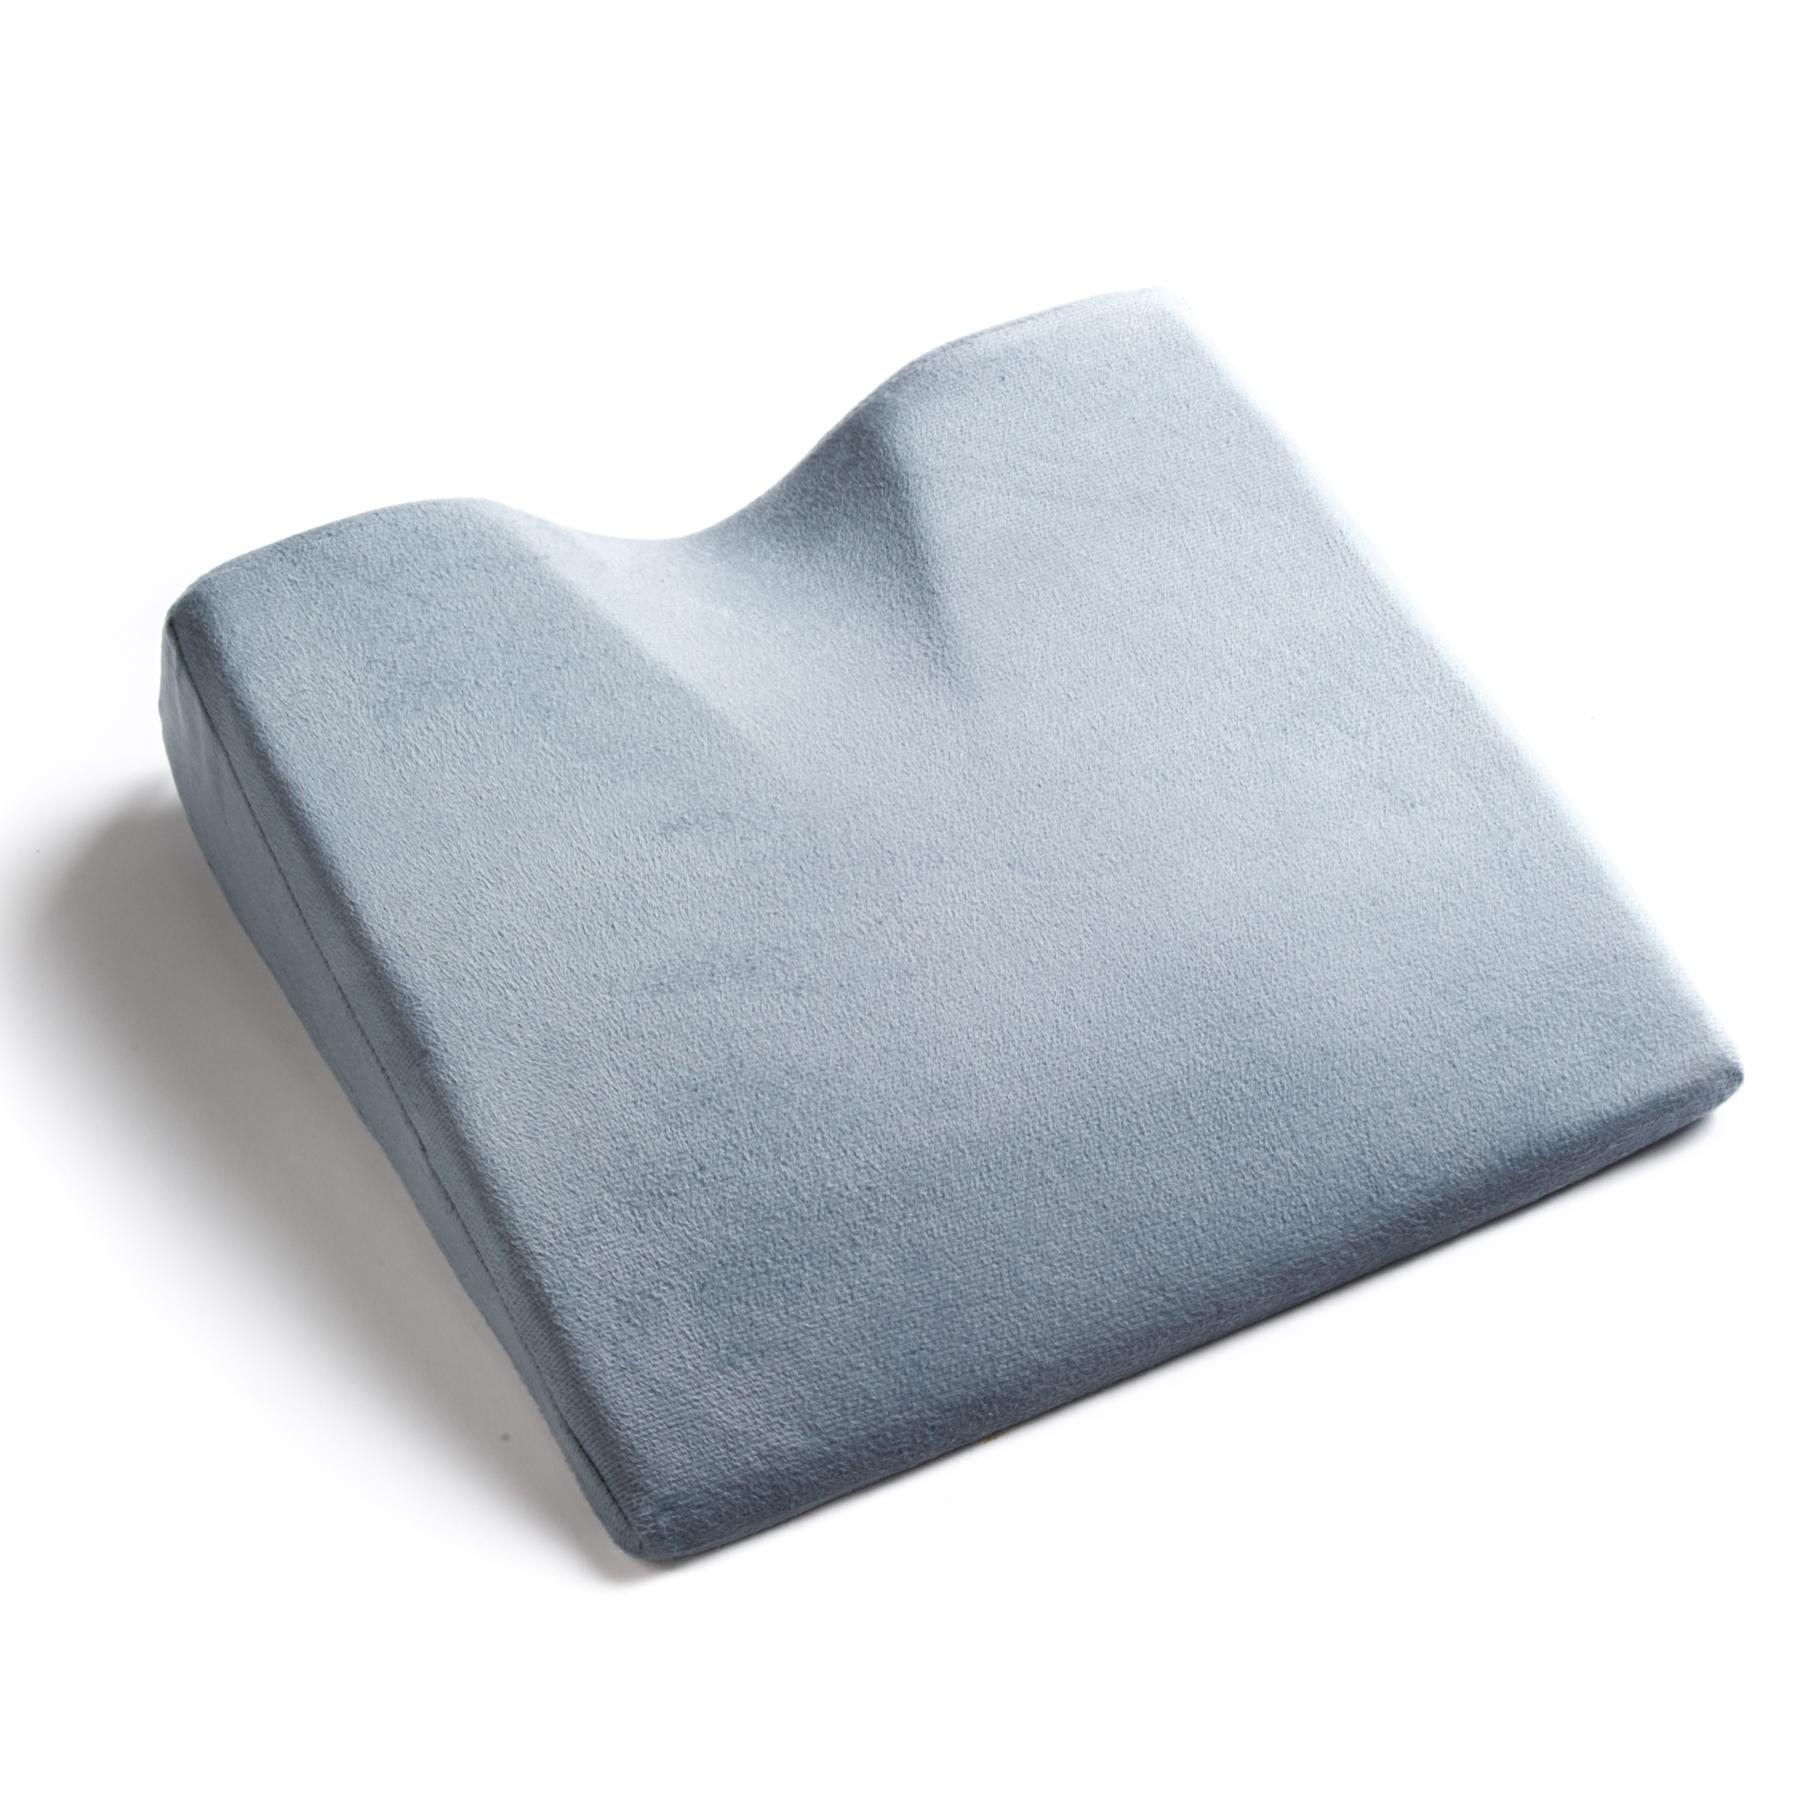 Black Mountain Products Memory Foam Wedge Seat Cushion